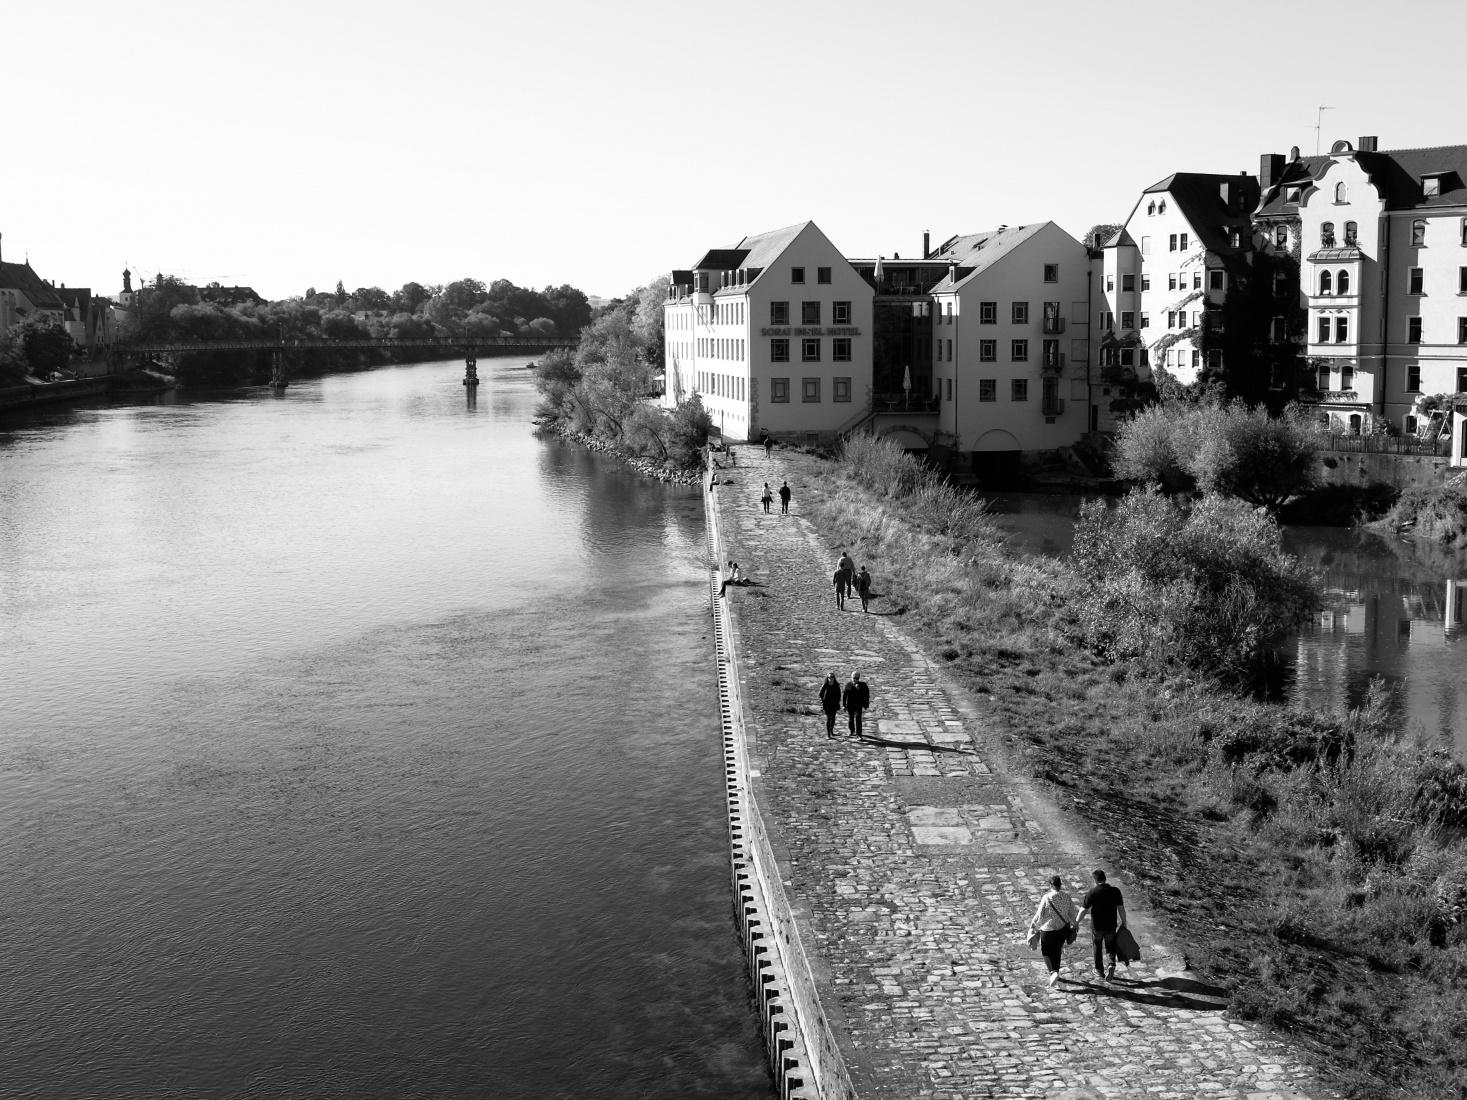 The city of Regensburg, Germany.